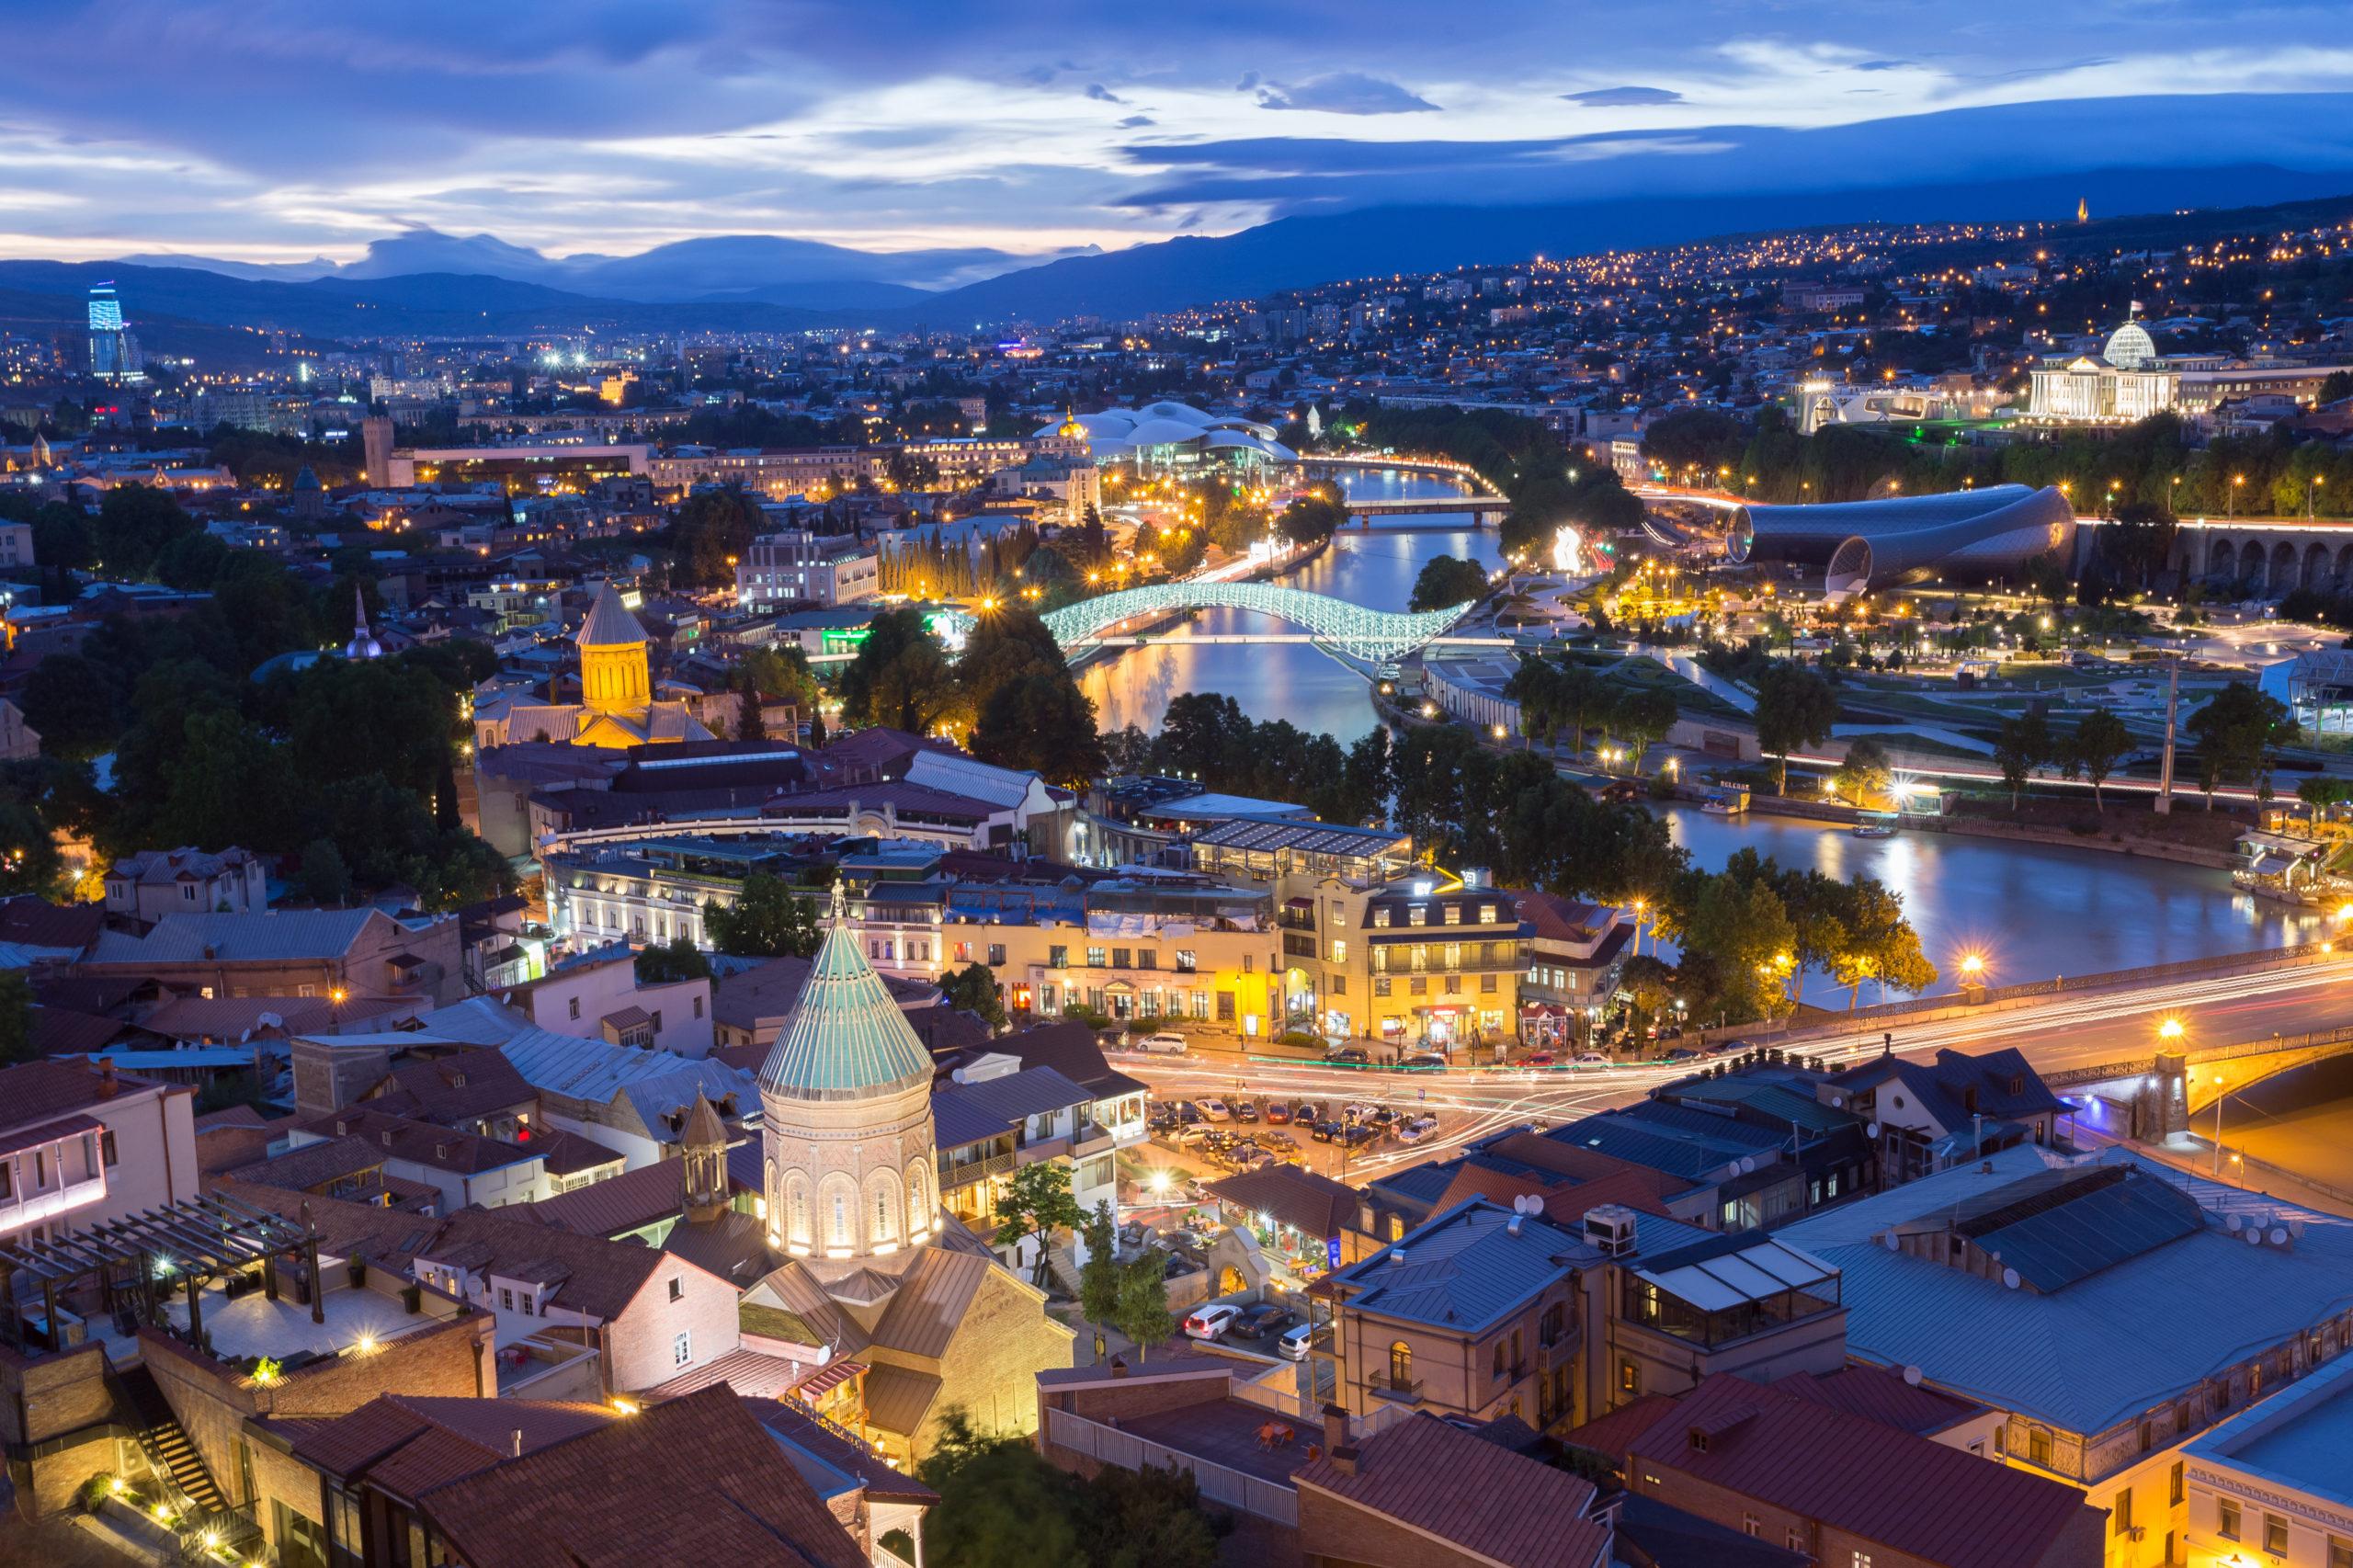 Tbilisi In evening light. Metekhi Bridge, Surb Gevorg Church and other famous landmarks.